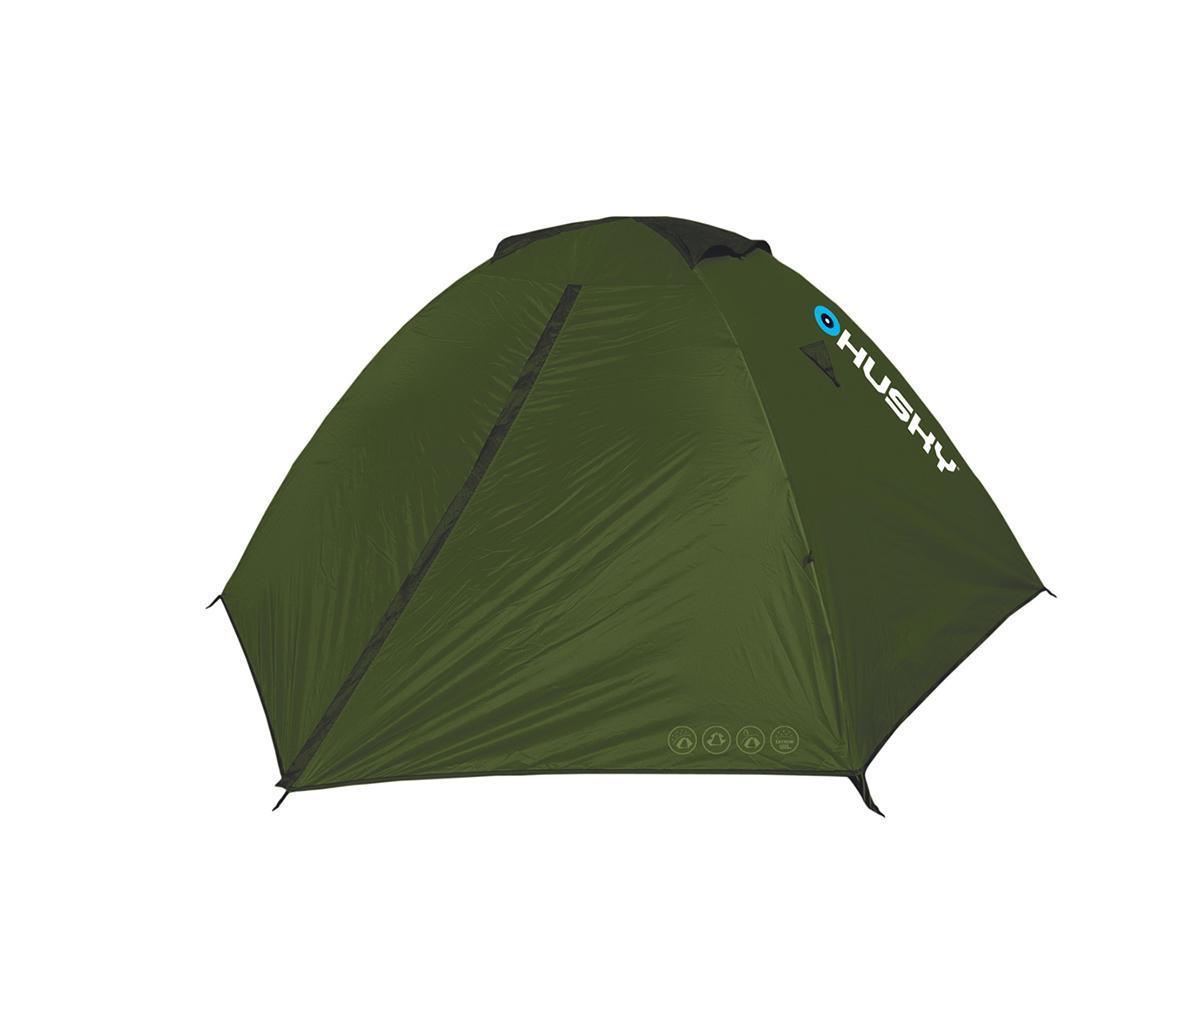 ... цвет: зеленый палатка husky bigless 5 dark green